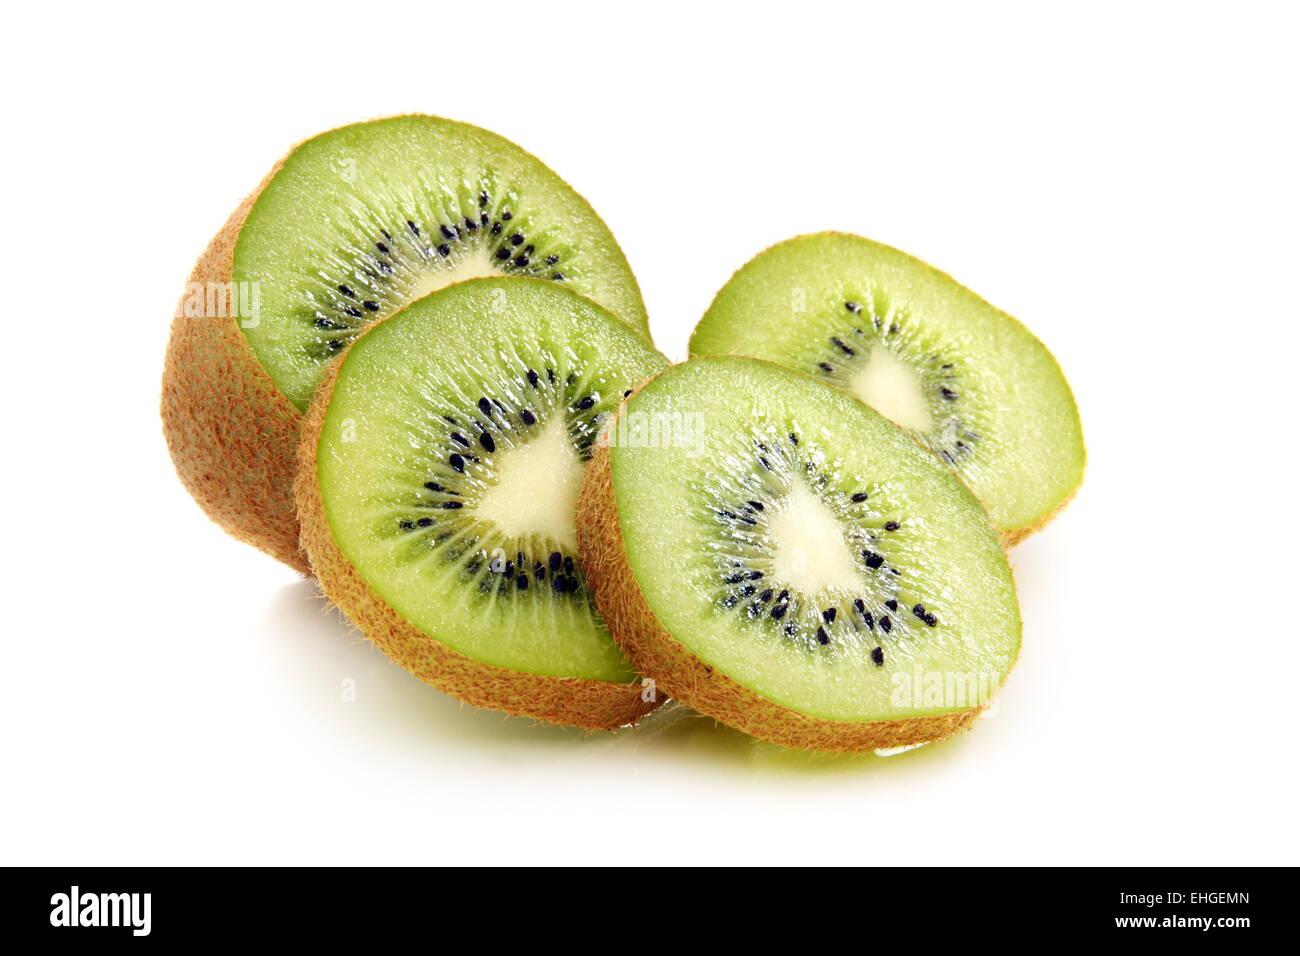 Kiwi fruit is cut into slices. - Stock Image